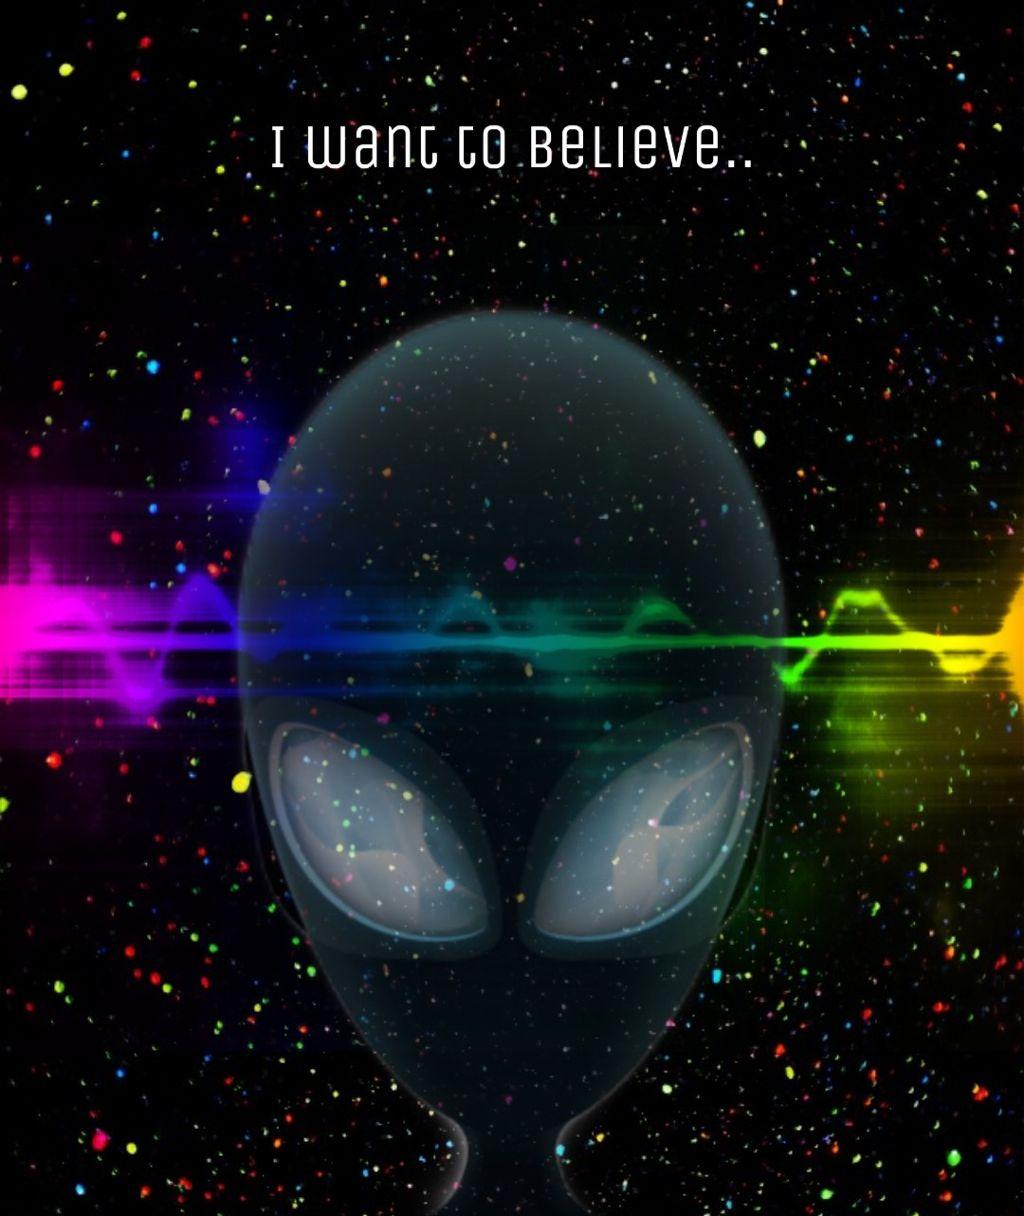 I want..  #freetoedit #ufo #planets #humanoid #fantasy #atr #space #galaxy #cosmos #stars #astronaut #cosmonaut #ray